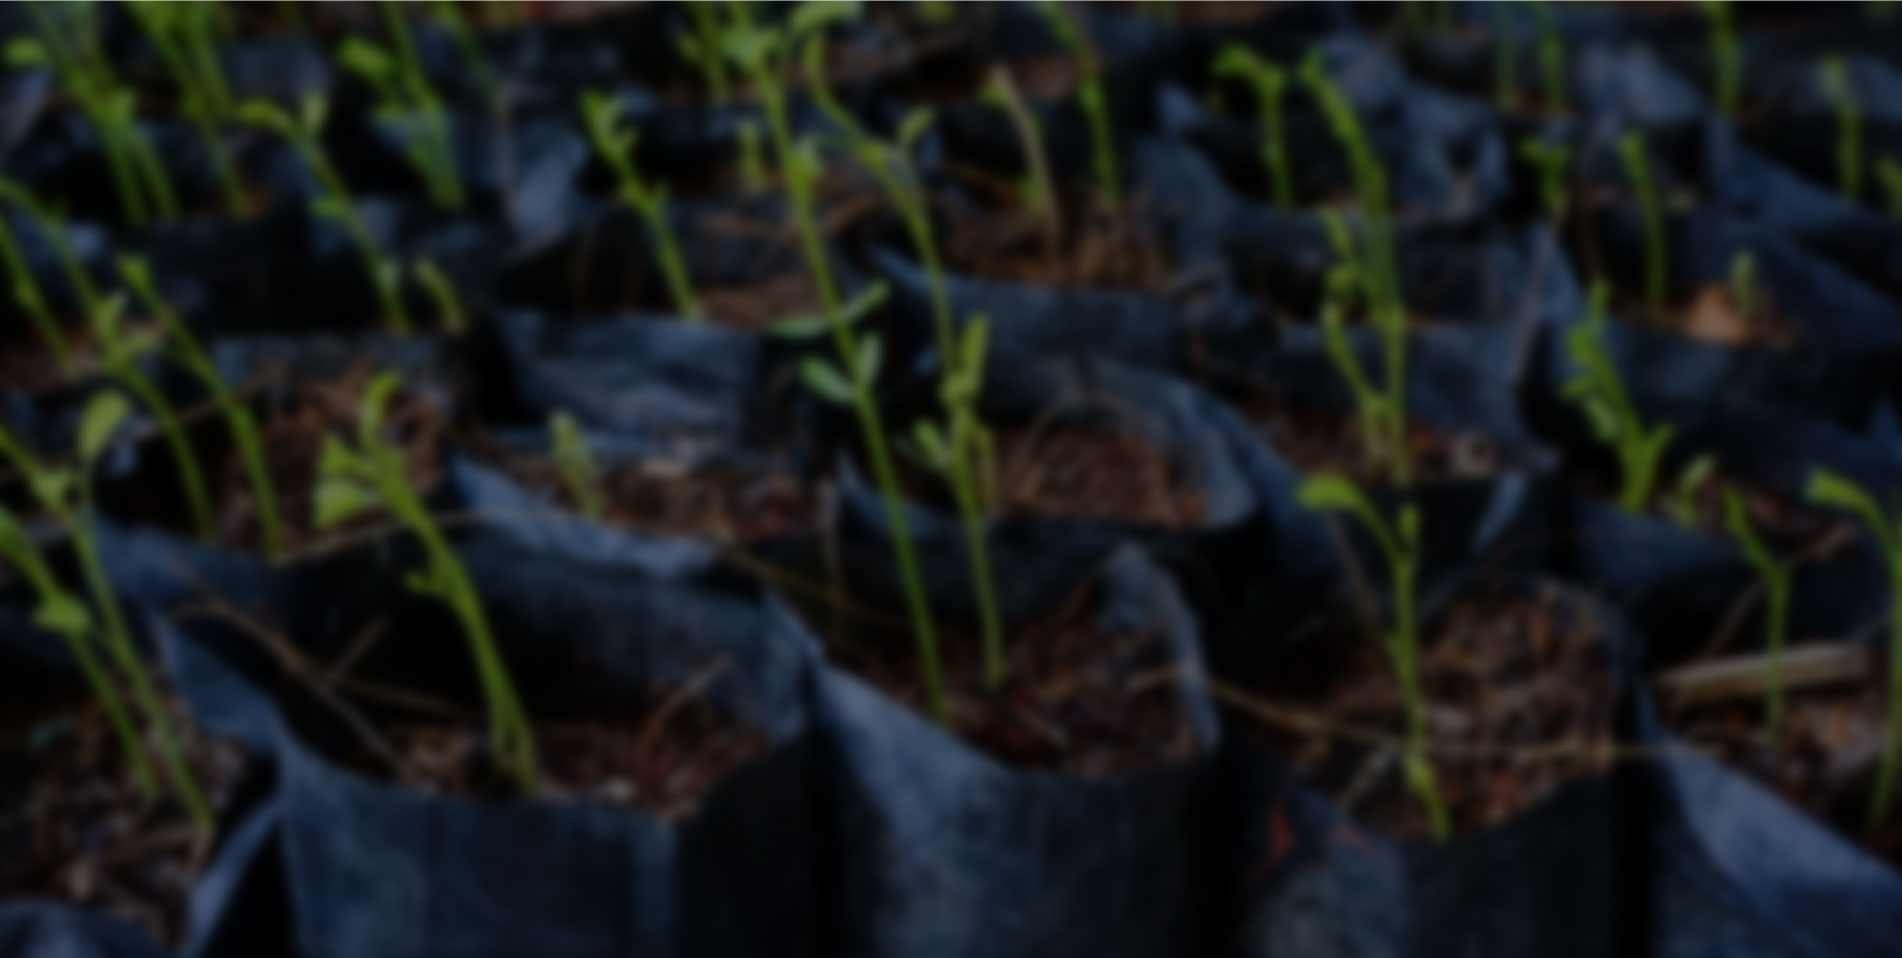 http://www.polytec.com.gt/sites/default/files/revslider/image/polytec-agroindustria.jpg